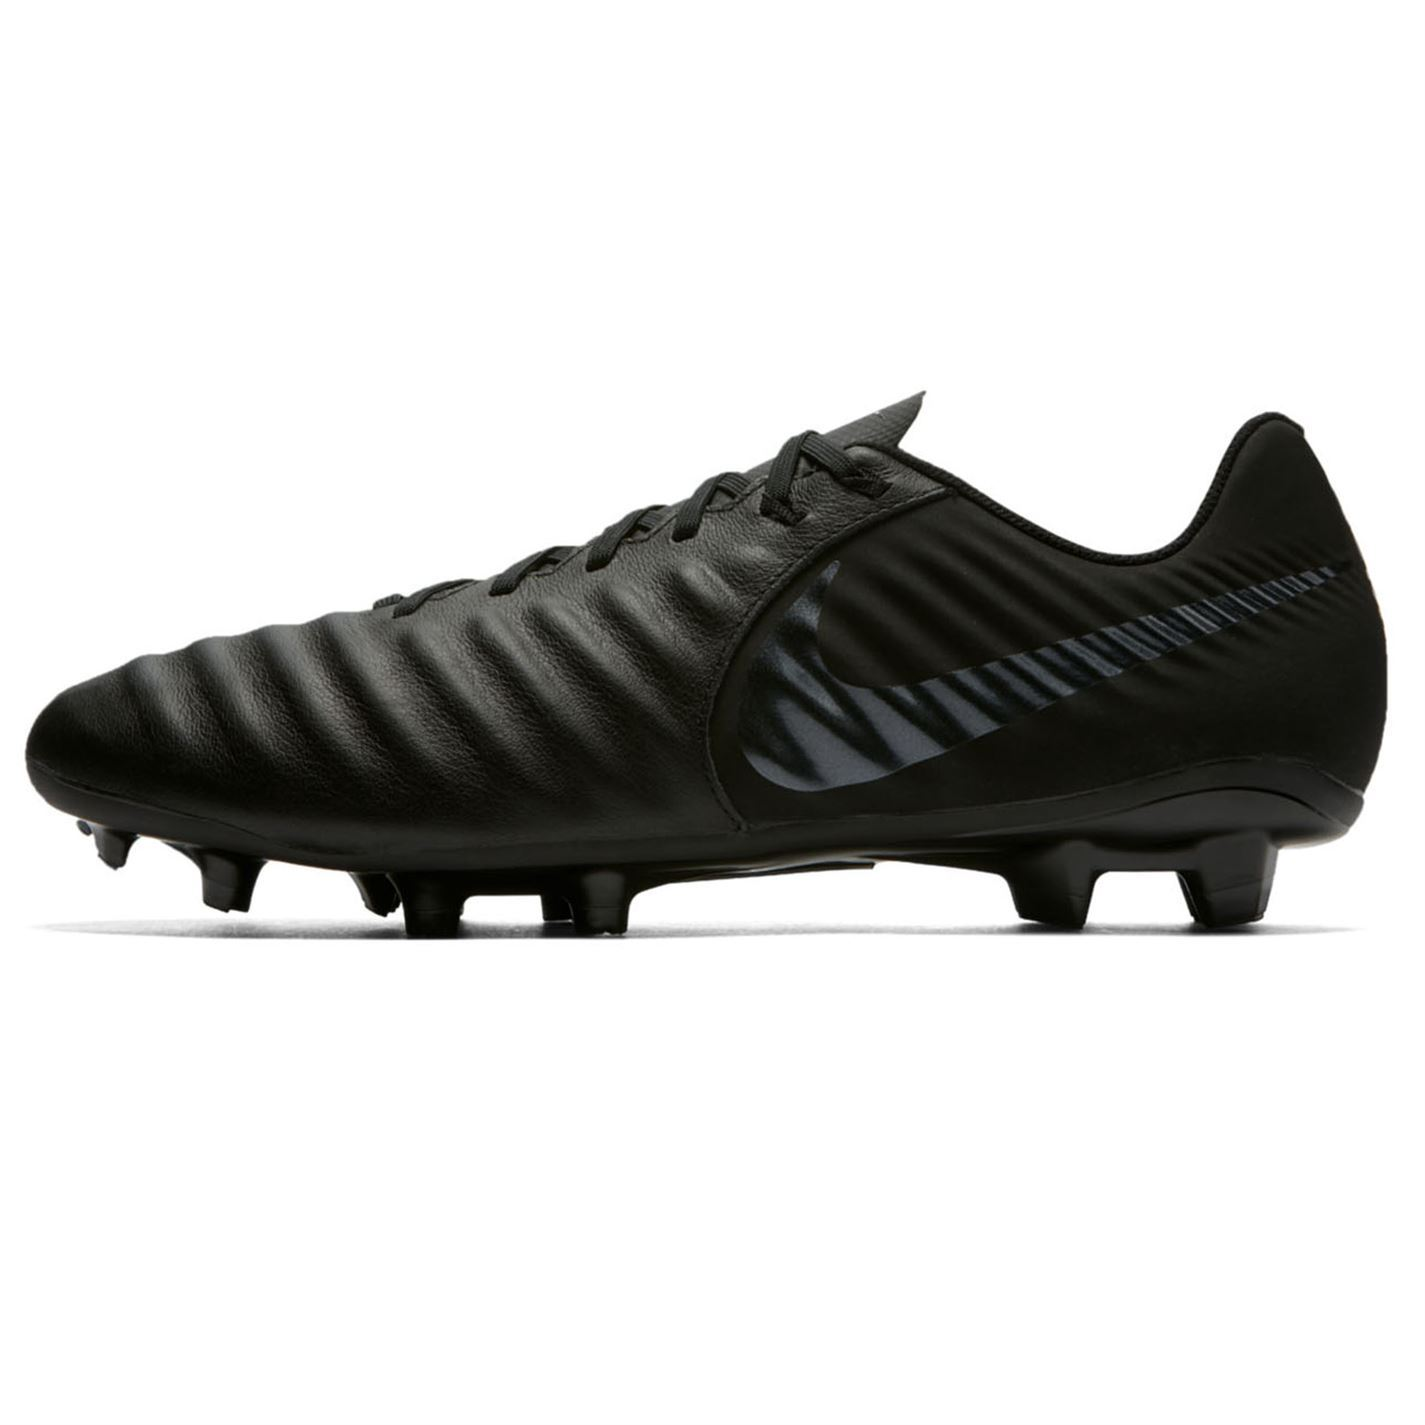 miniature 4 - Nike-Tiempo-Legend-Academy-FG-Firm-Ground-Chaussures-De-Football-Homme-Football-Chaussures-Crampons